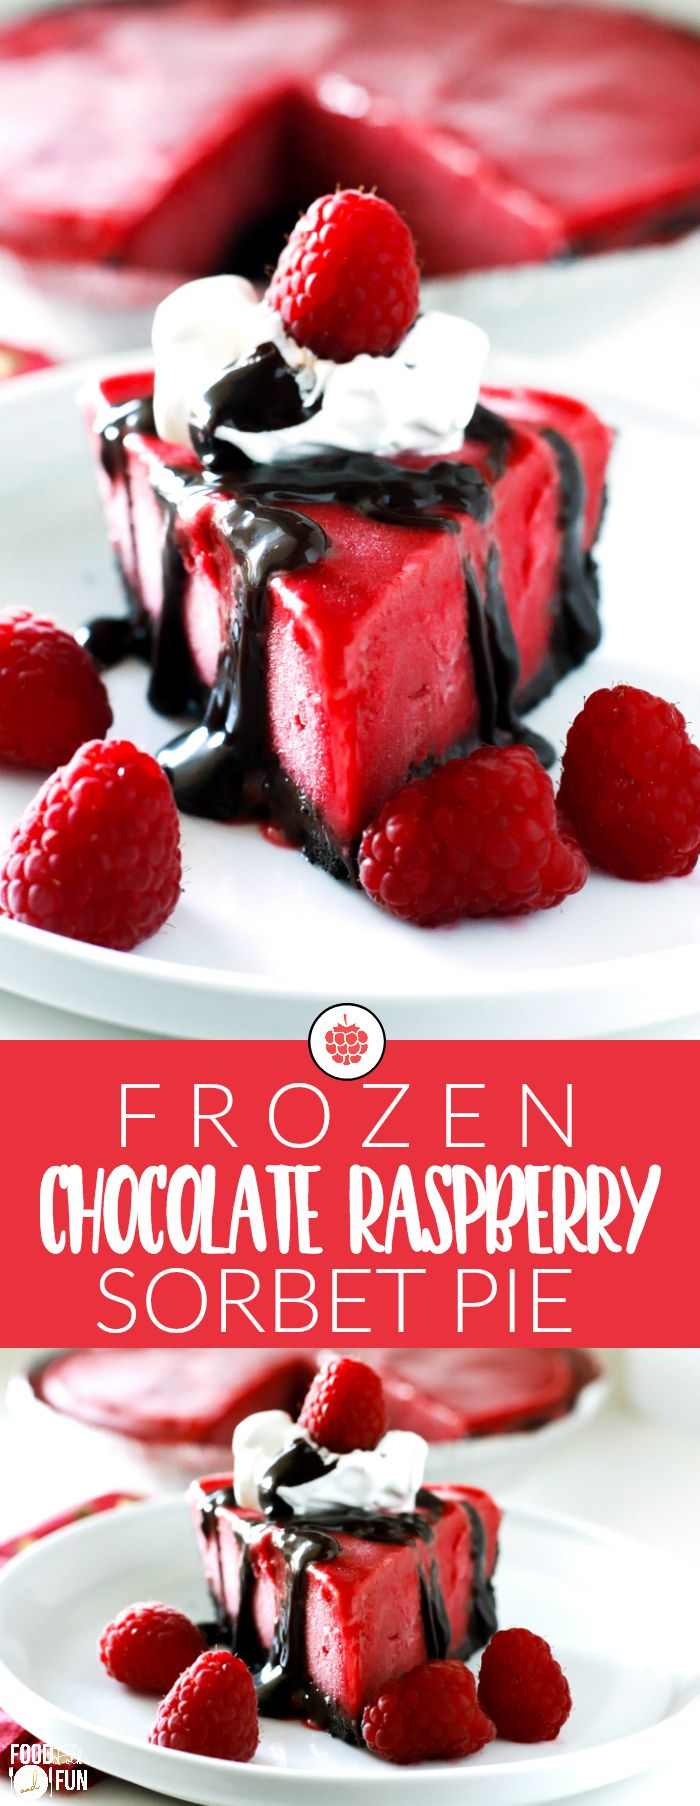 Oreo cookie crust, rich hot fudge, and luscious raspberry sorbet pair perfectly to make this Frozen Chocolate Raspberry Pie truly divine! | Raspberry Dessert | Summer Recipe | Summer Dessert | Easy Dessert | Frozen Dessert